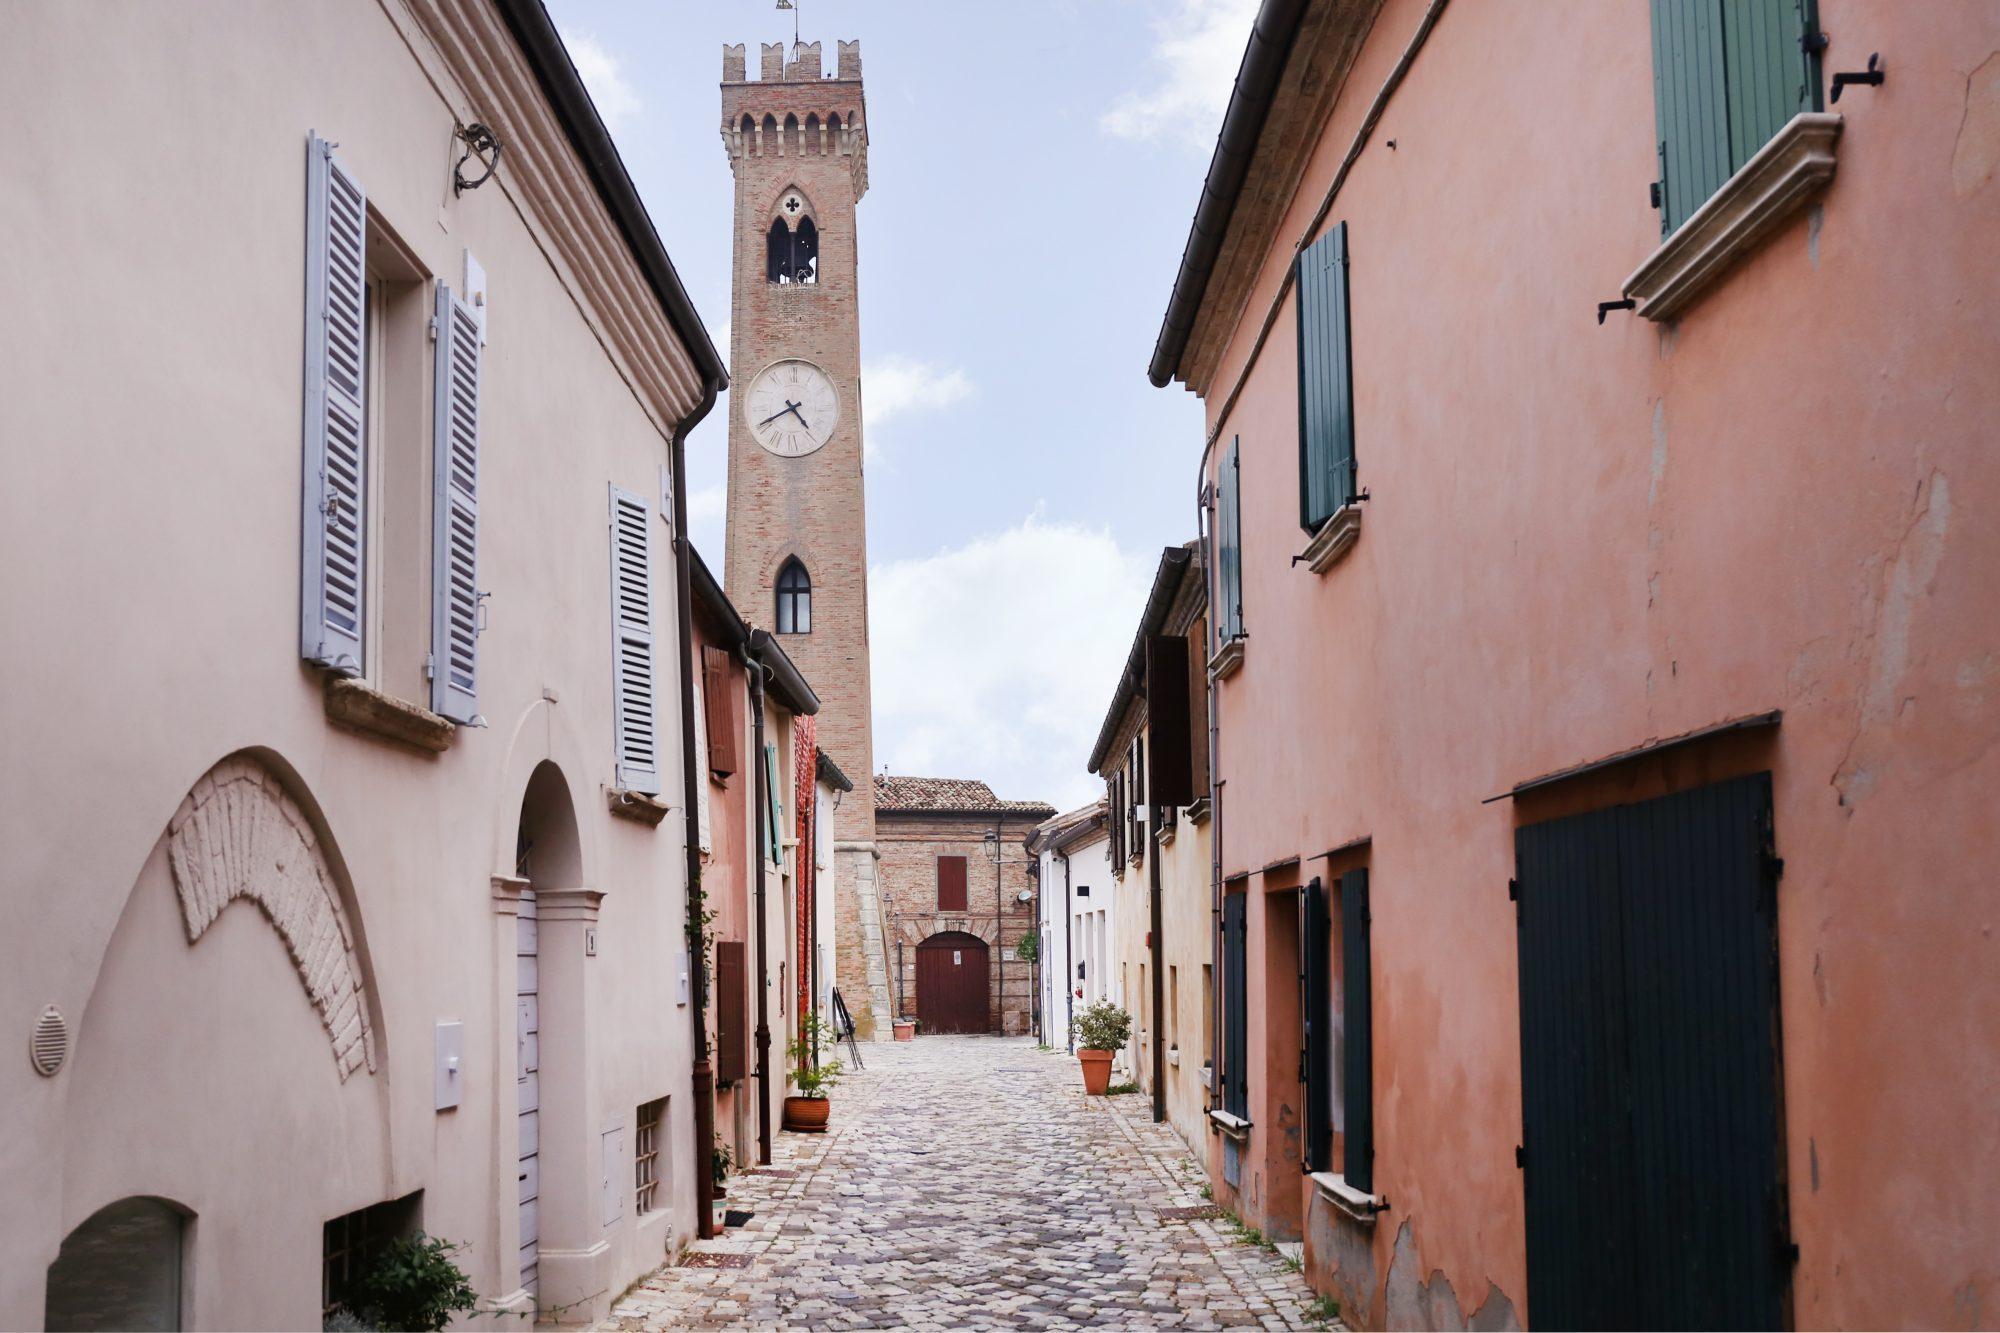 LandOutriders - Un weekend in Romagna con Pier Giulio Caivano | Collater.al 6